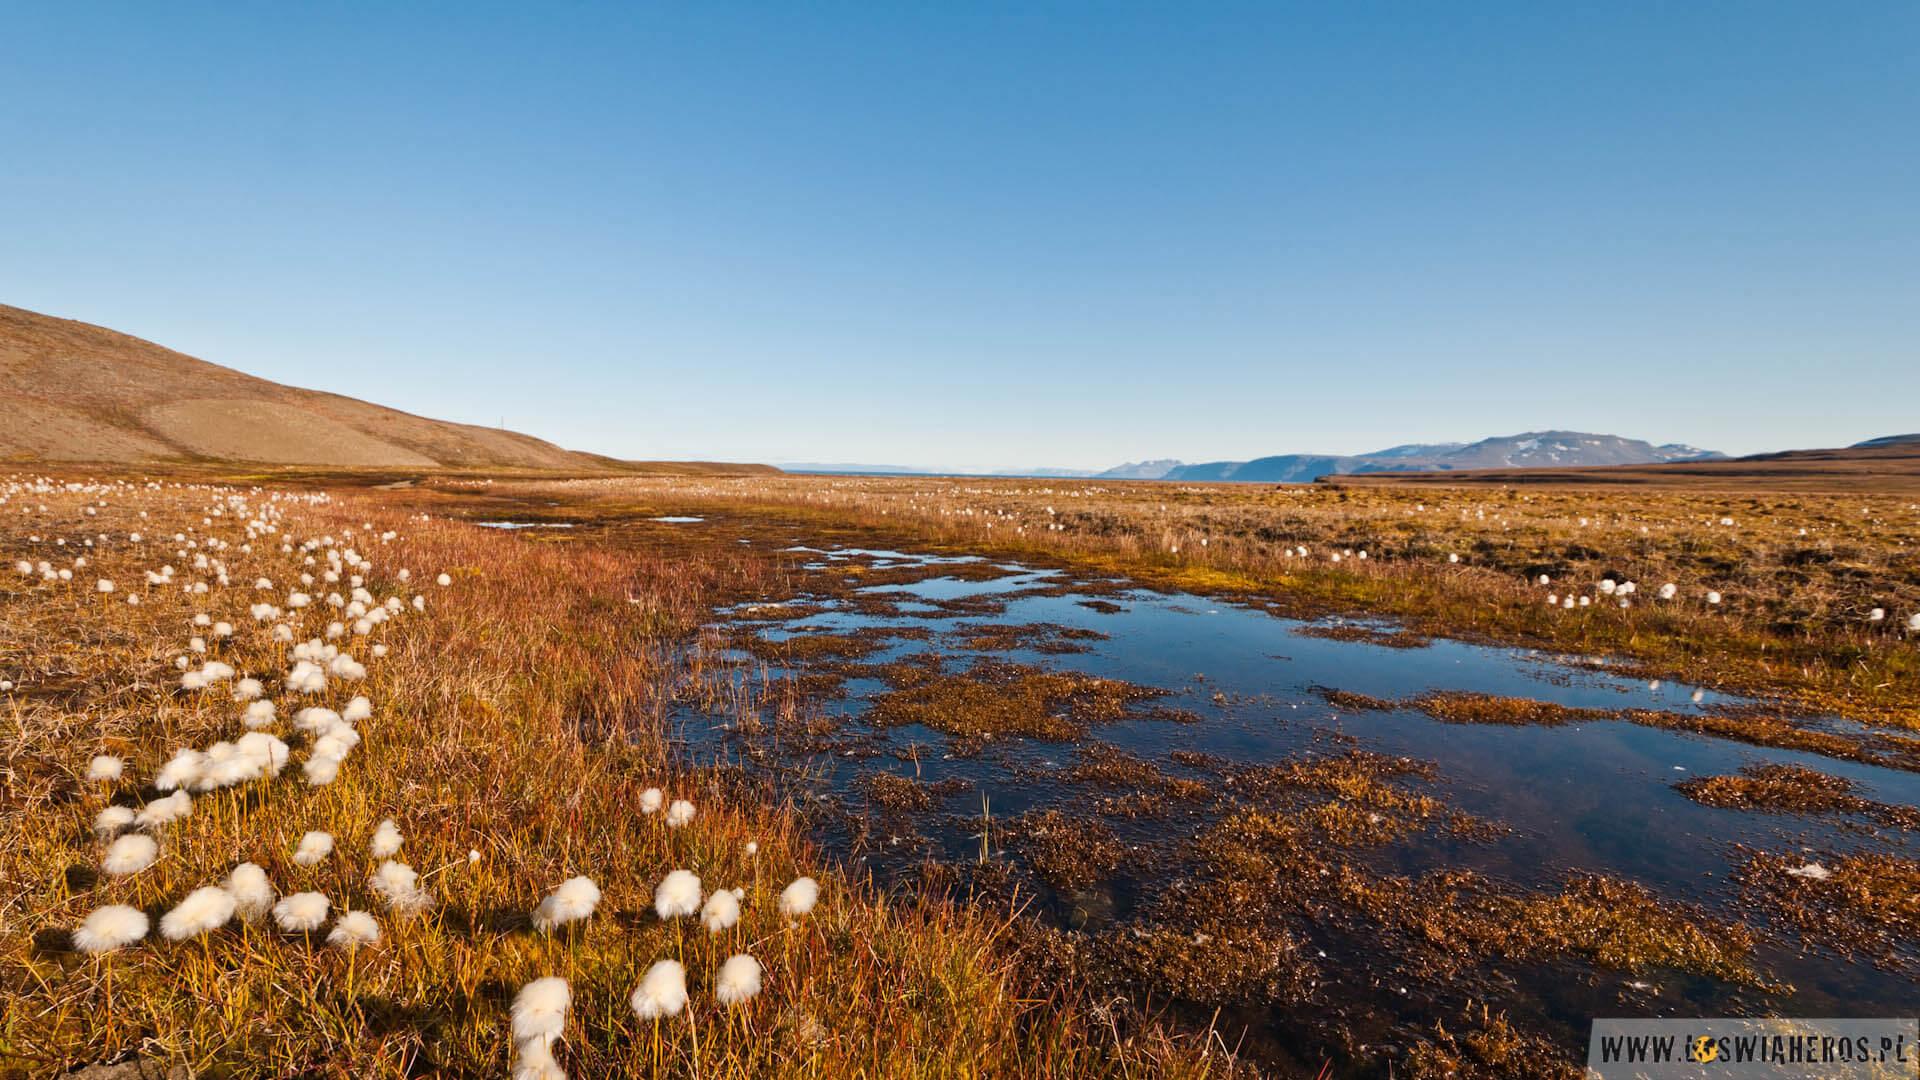 Tundra wsierpniu, tonasiąknięta wodą gąbka.